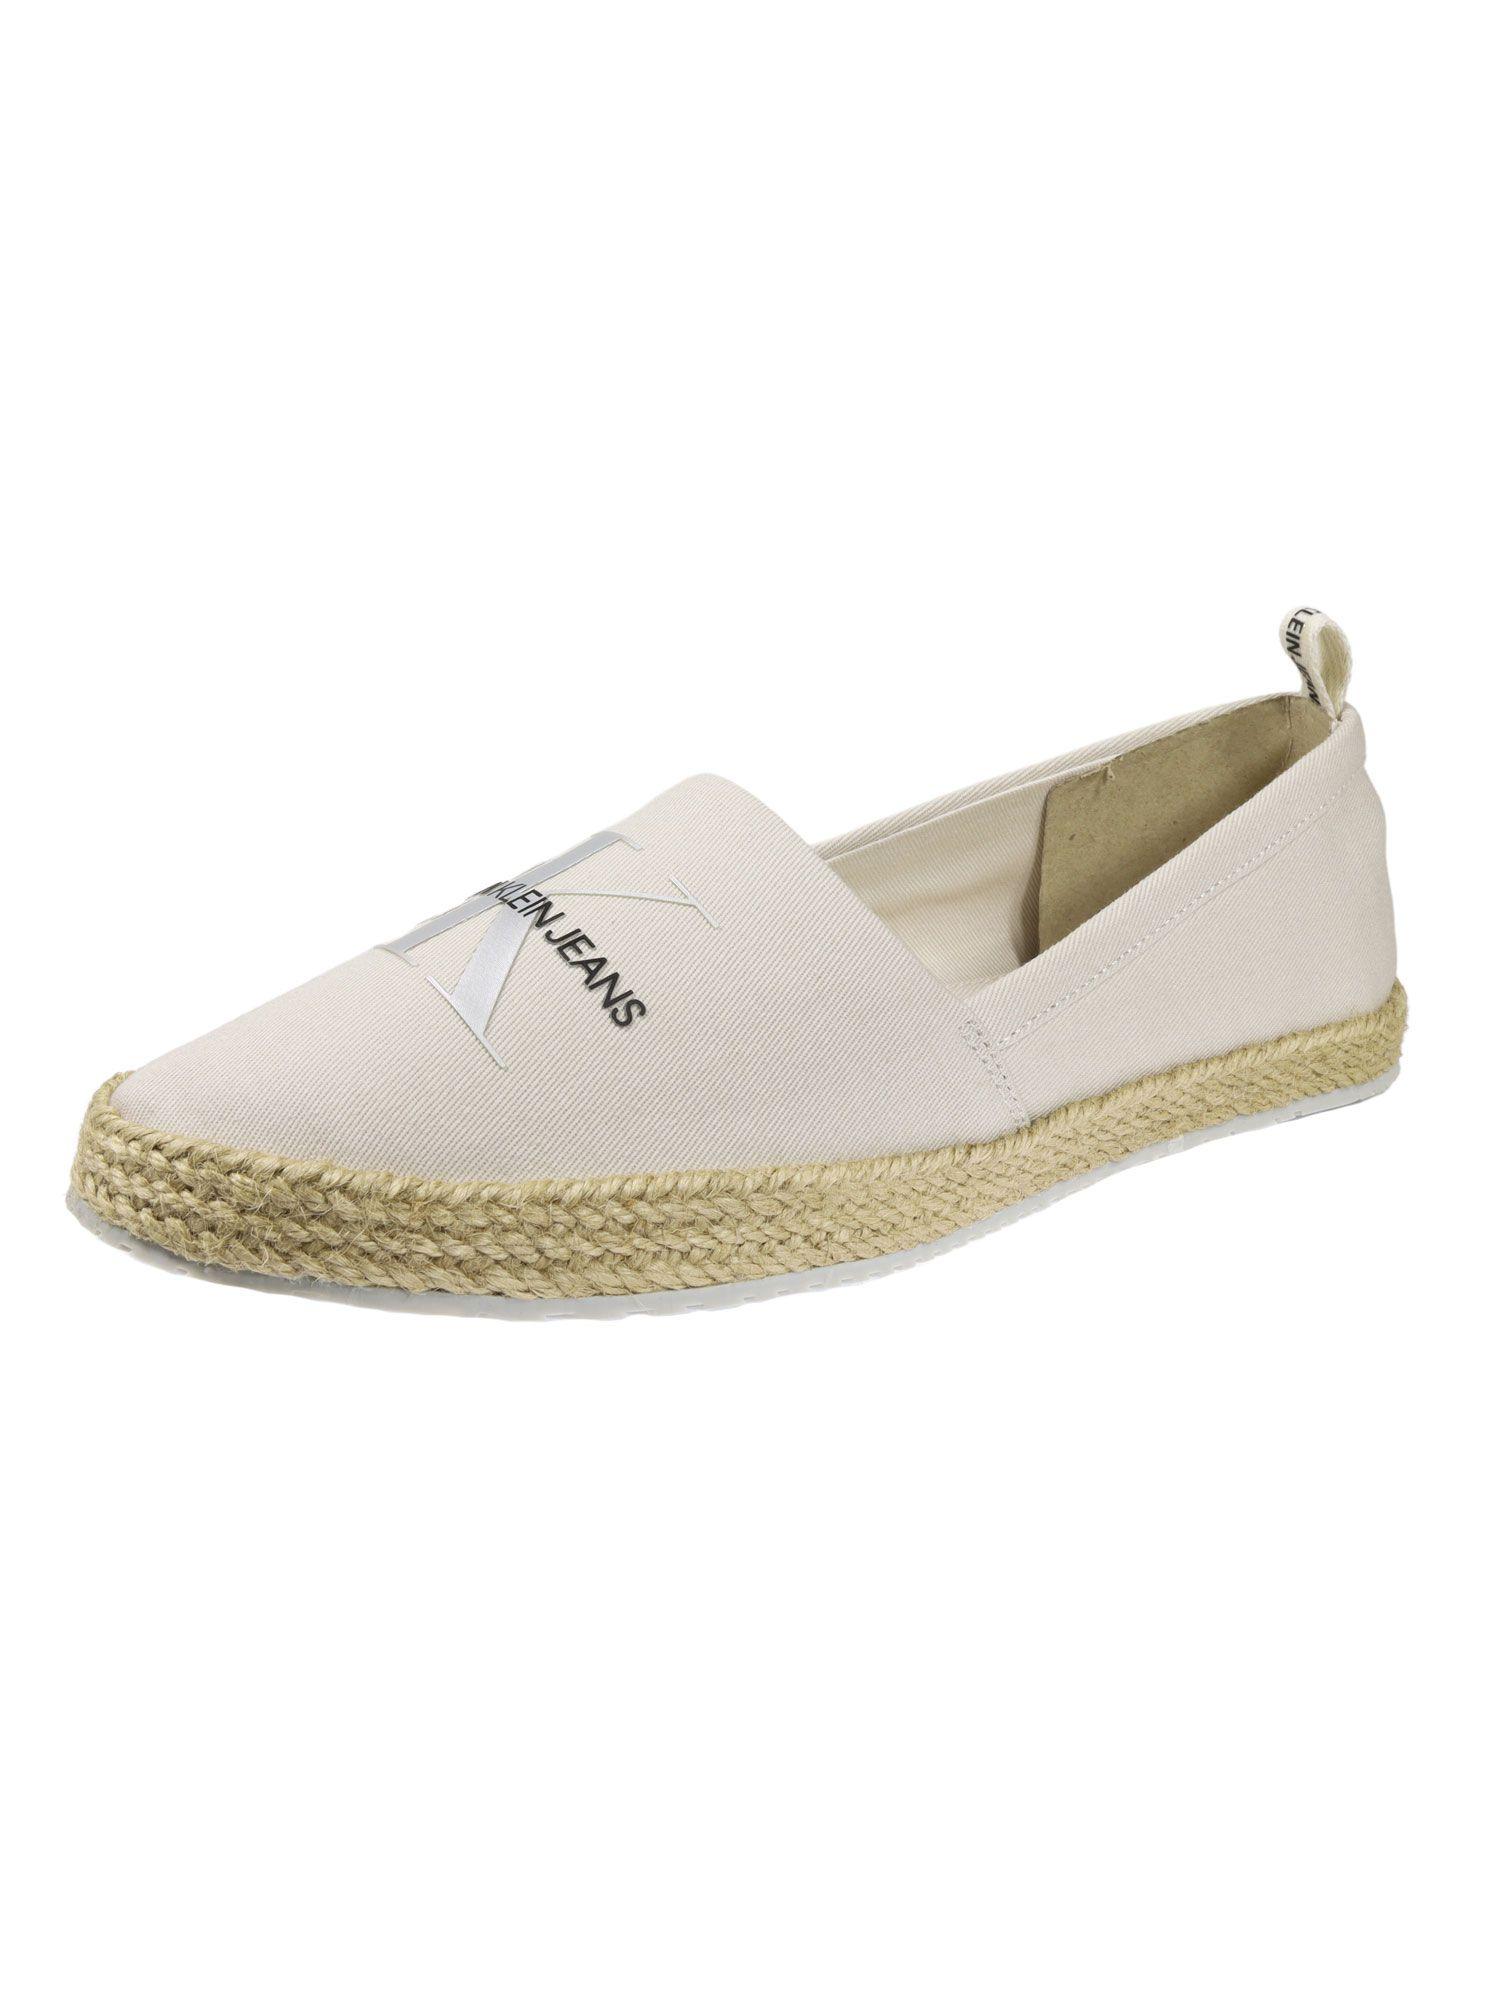 Calvin Klein Damen Schuhe Espandrille Printed Beige Slipper 36 EU